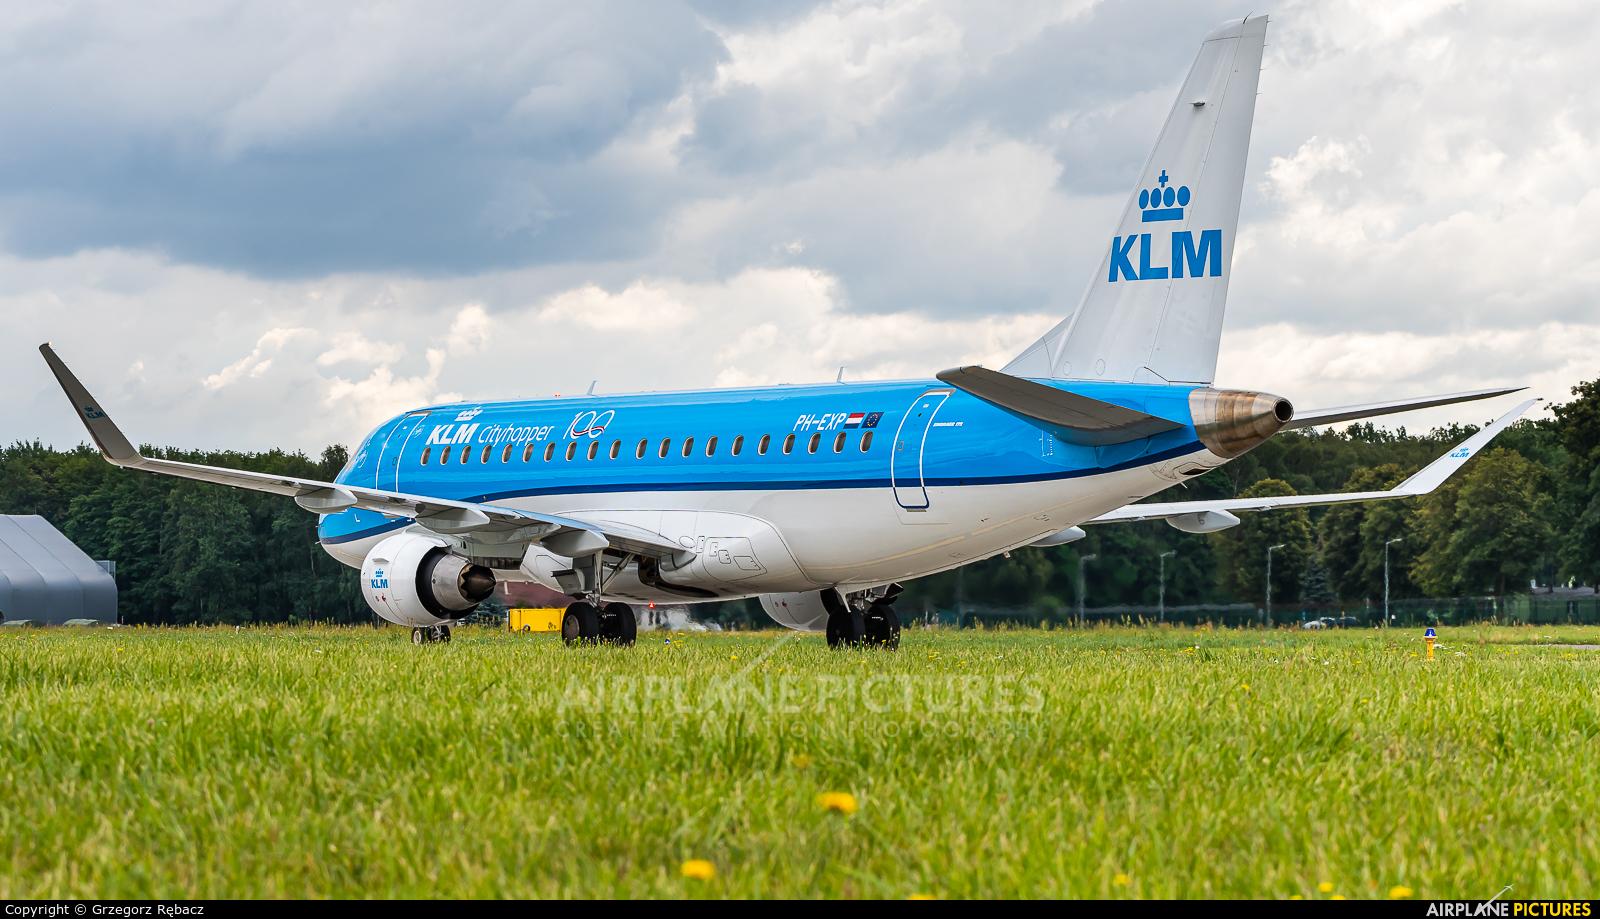 KLM Cityhopper PH-EXP aircraft at Kraków - John Paul II Intl